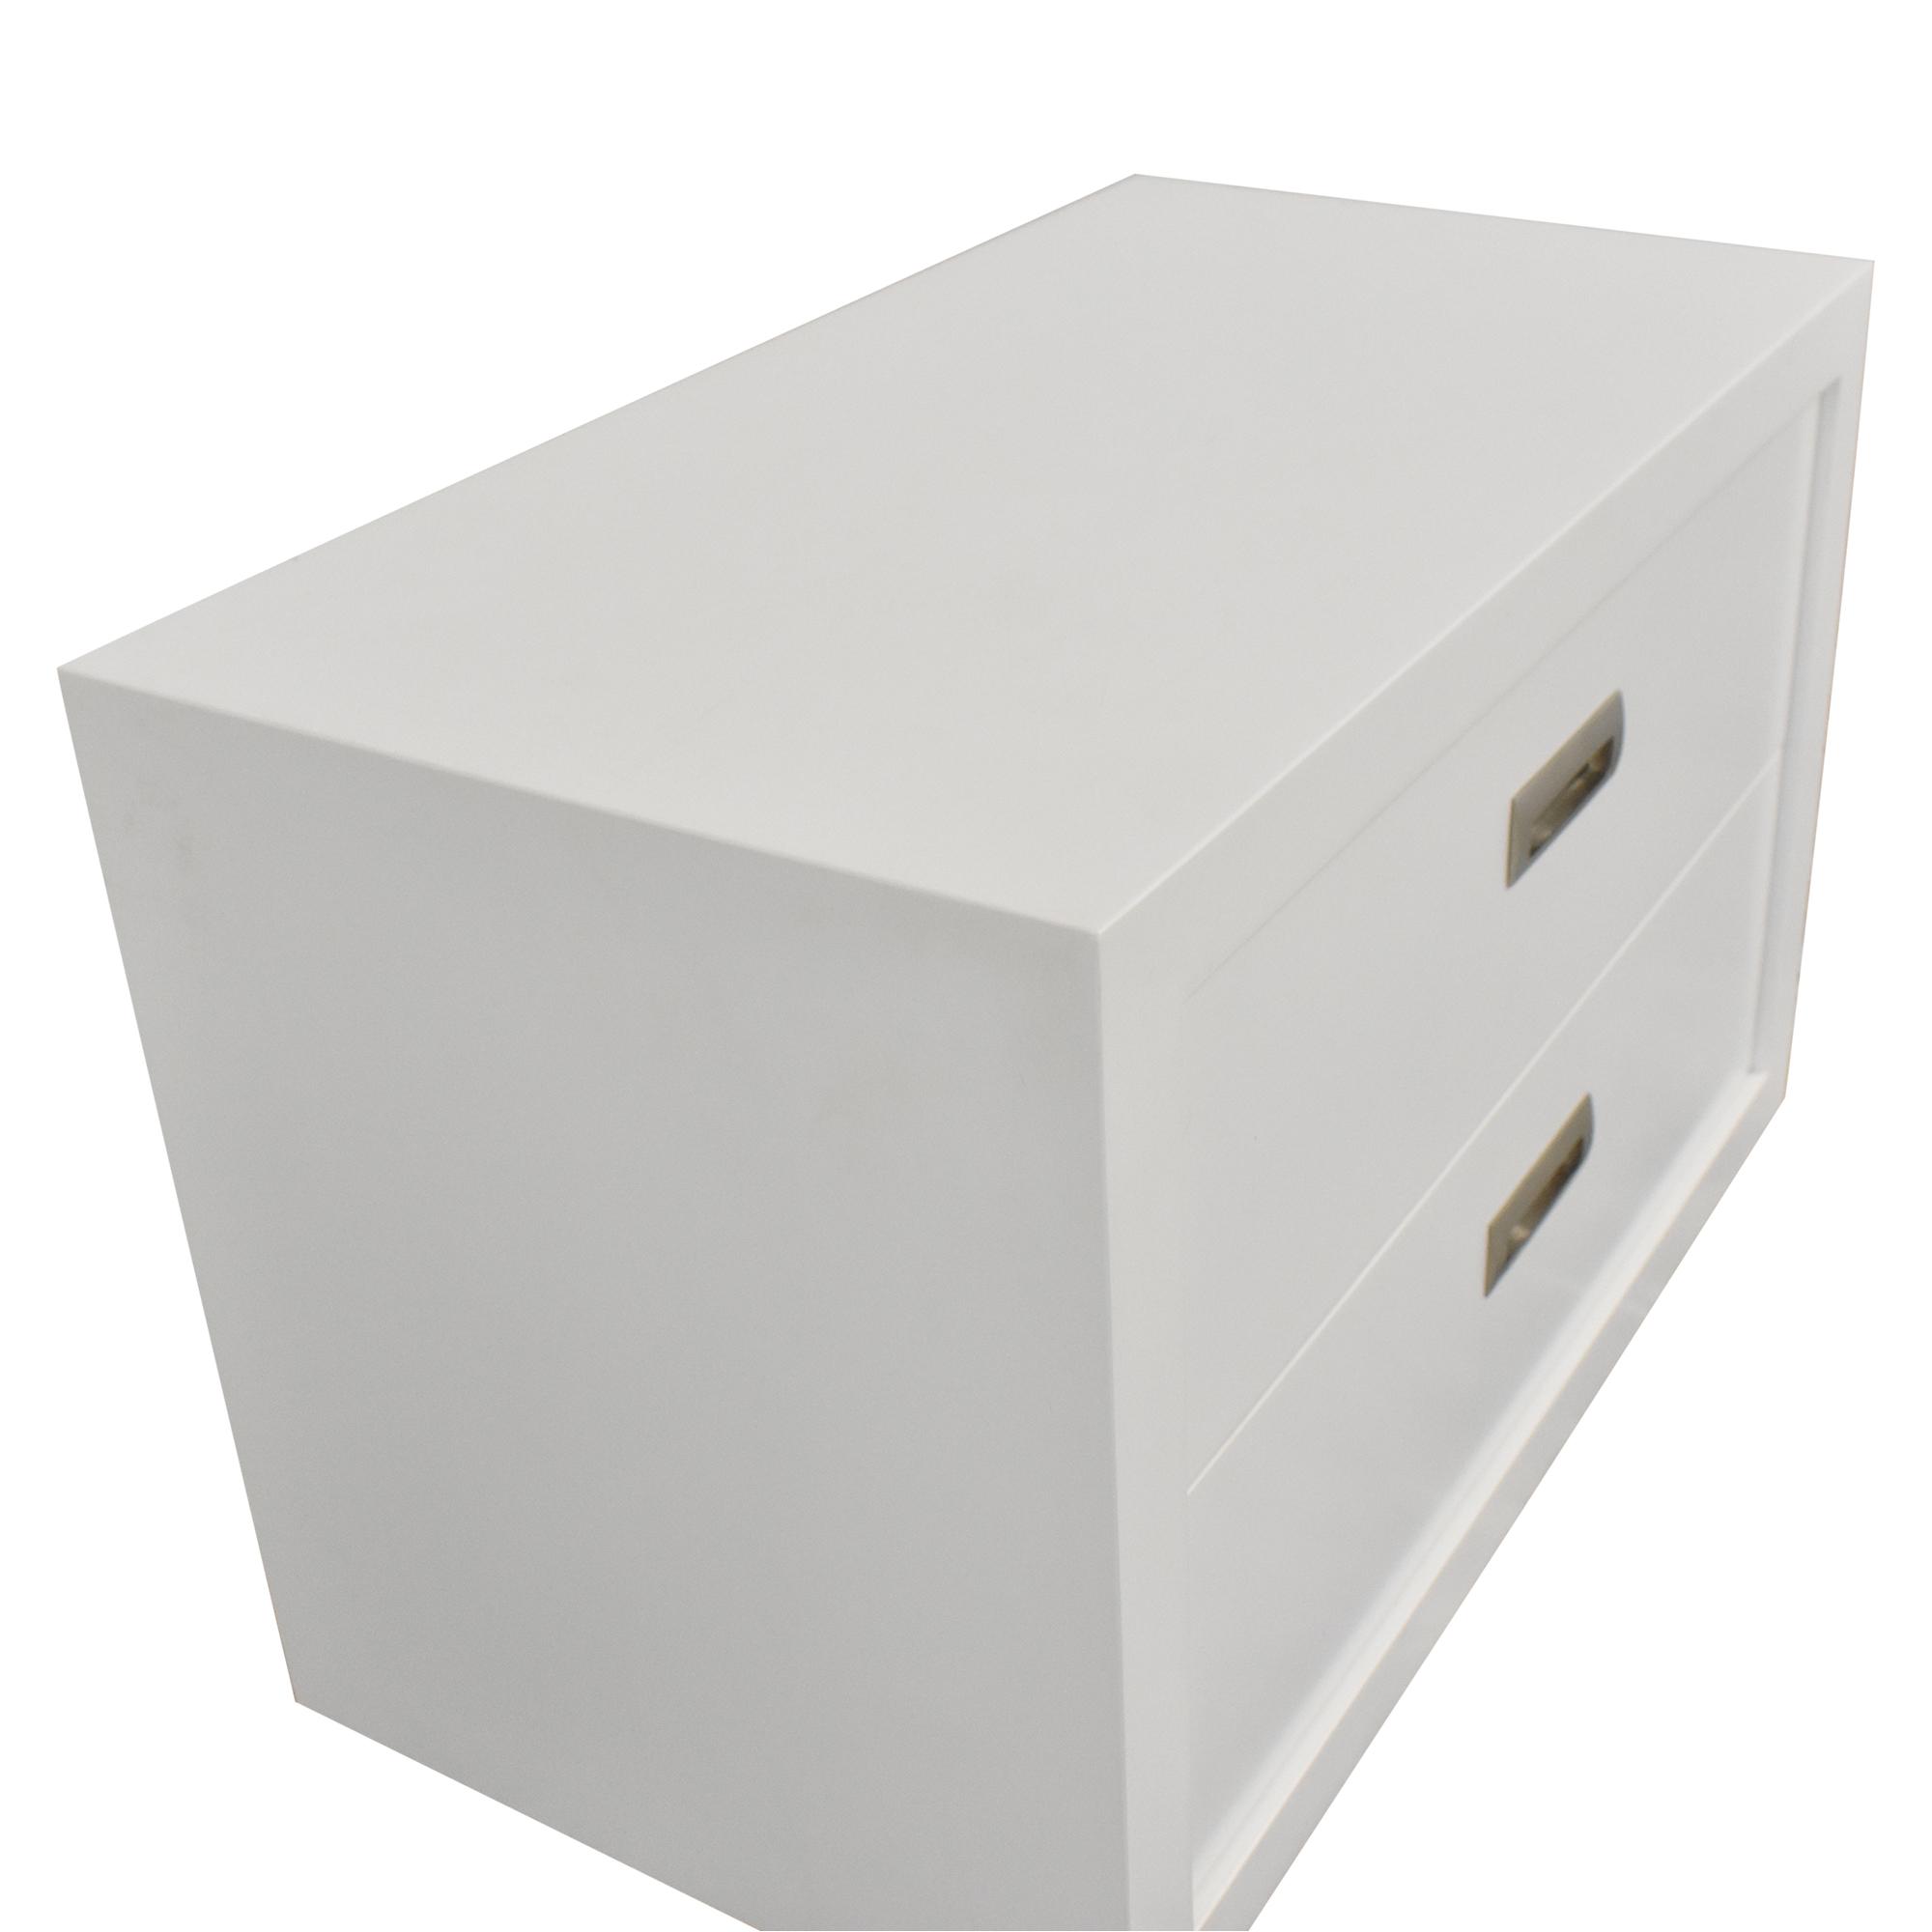 buy Crate & Barrel Crate & Barrel Aspect Modular 2-Drawer Storage Unit online